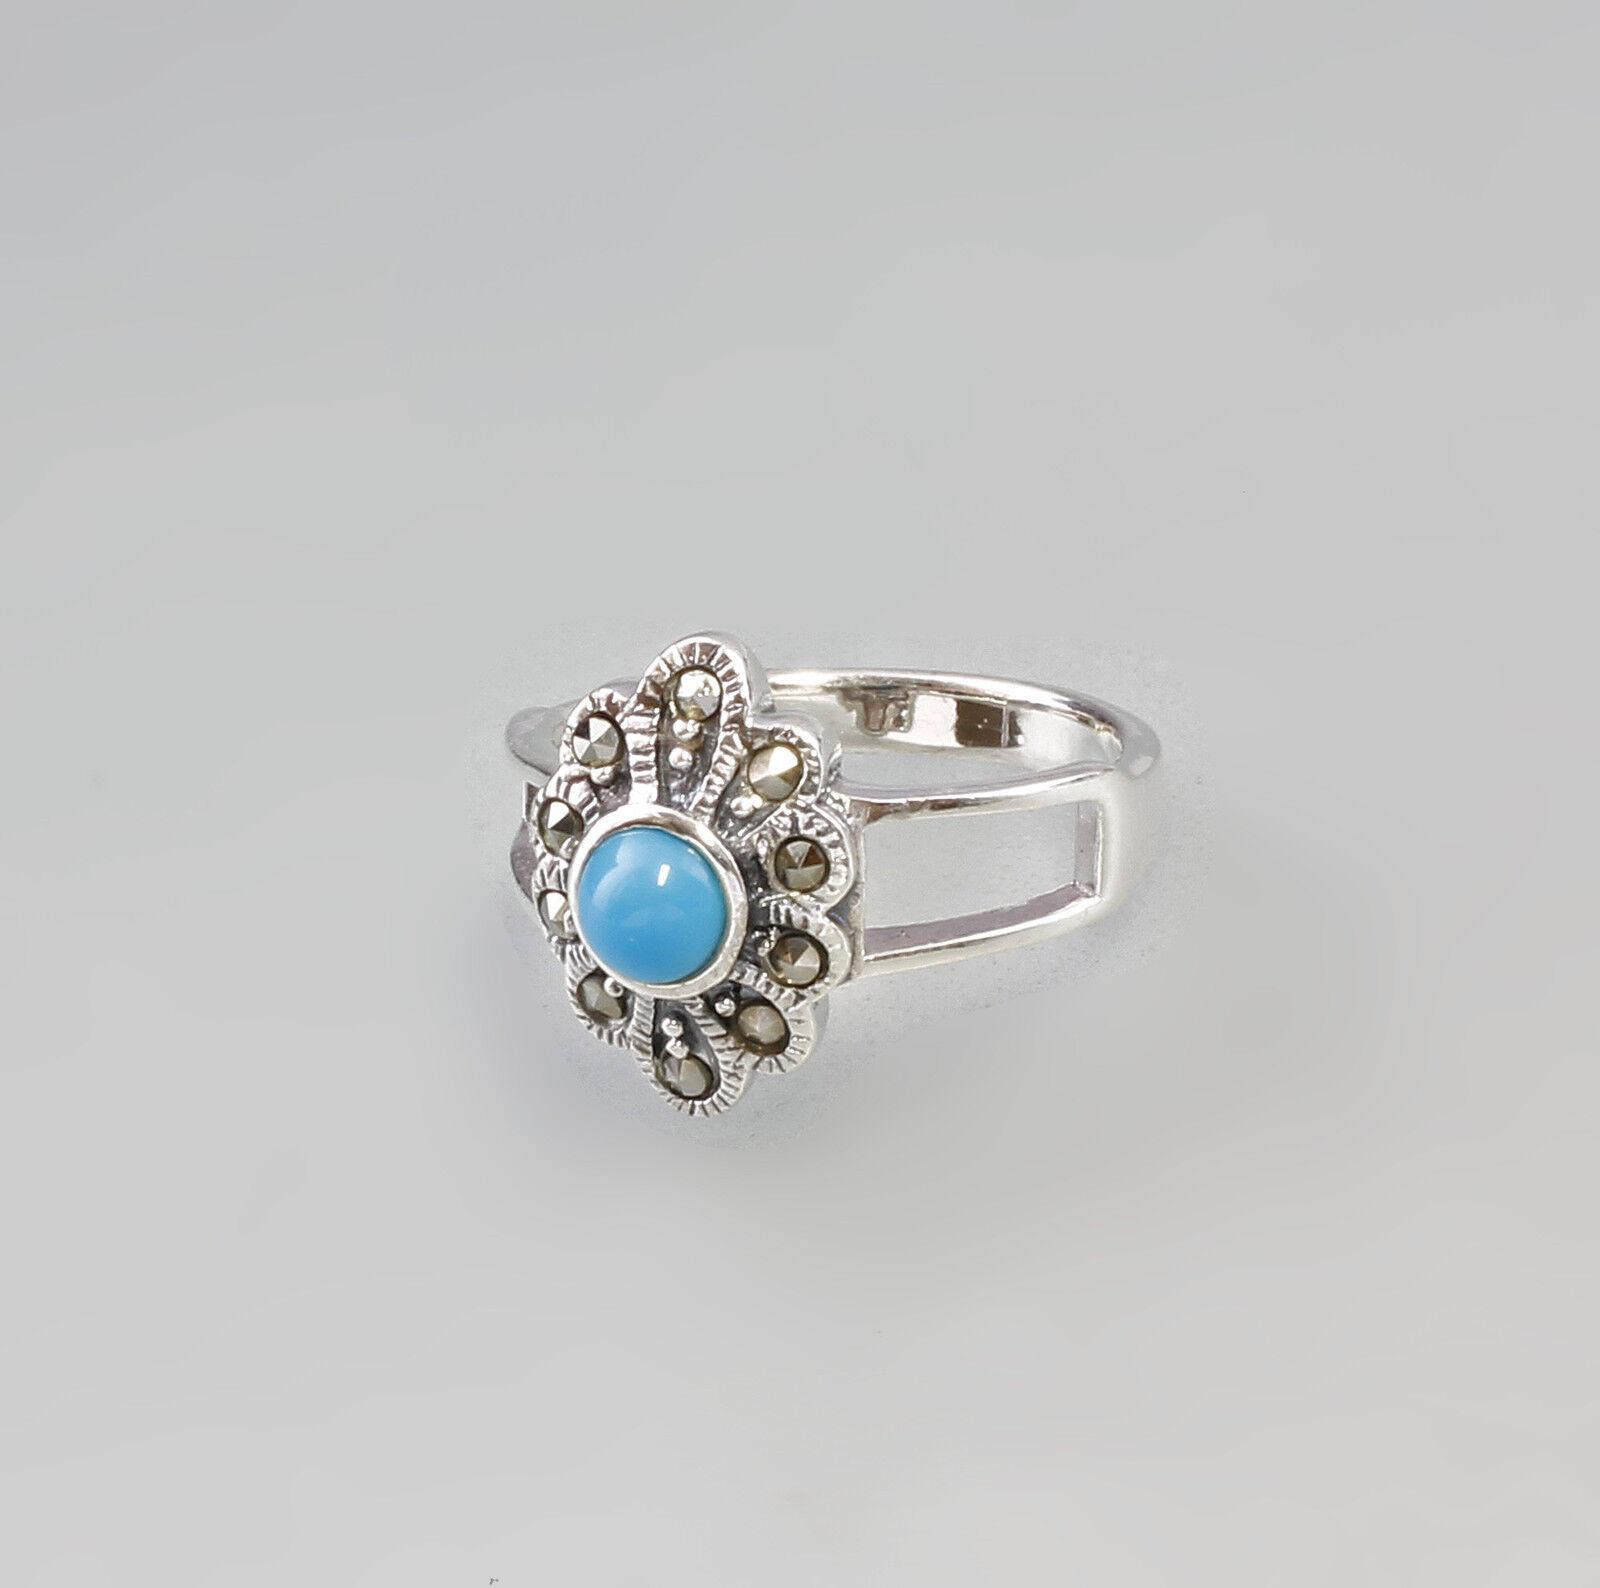 Blütenförmiger Markasit Ring mit türkisfarbenem Stein 925er silver 9927374